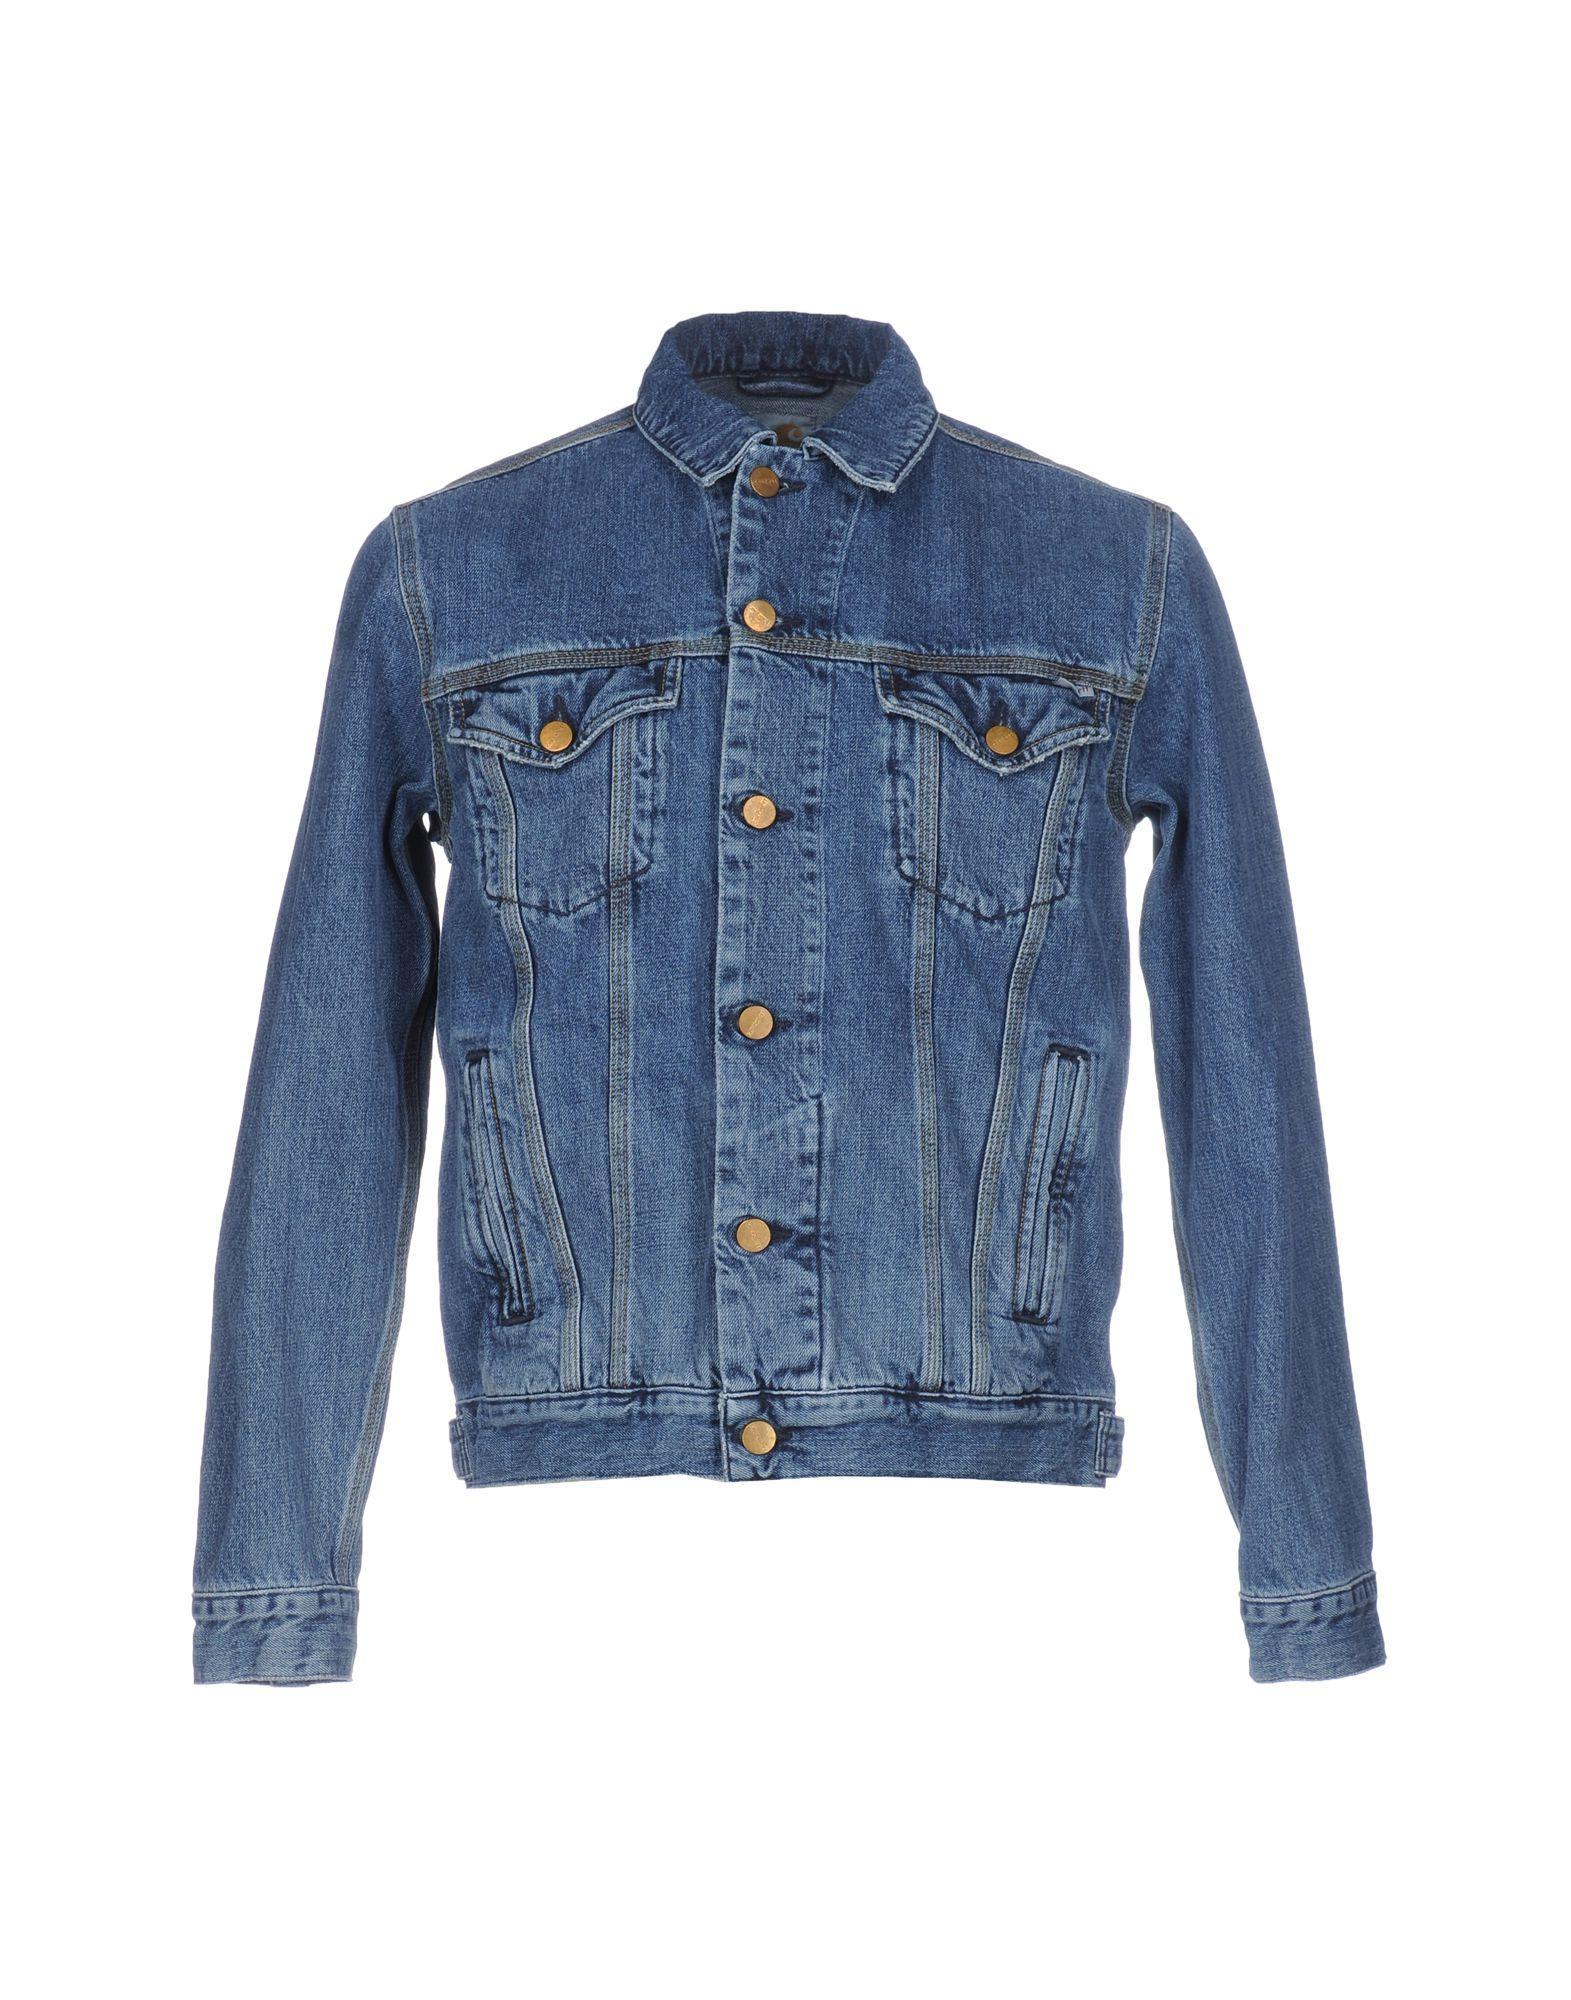 Giubbotto Jeans Carhartt Uomo - Acquista online su